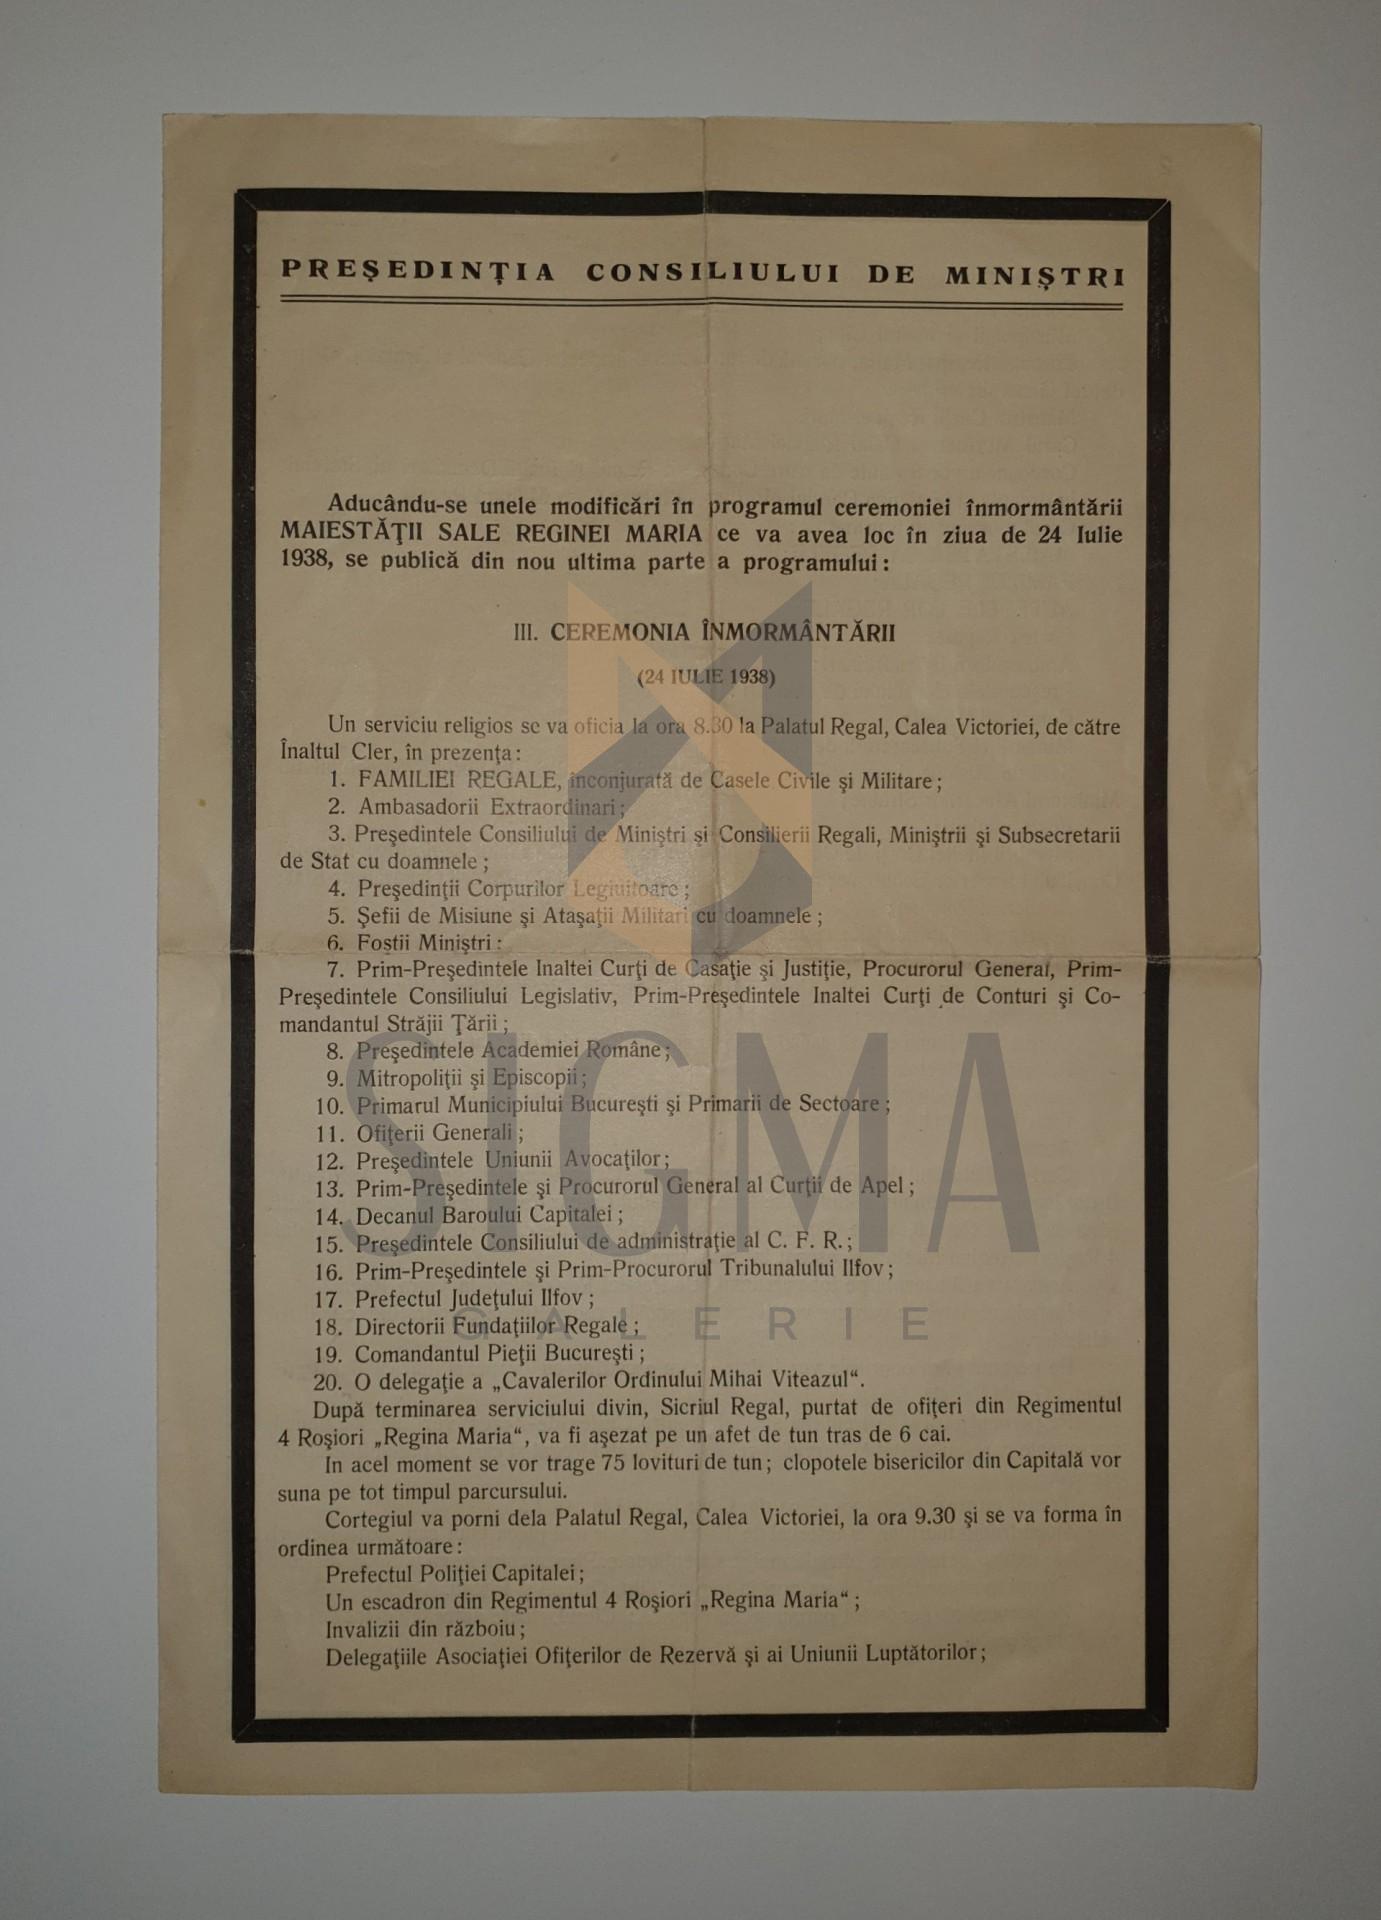 REGINA MARIA A ROMANIEI, PROGRAMUL CEREMONIEI INMORMANTARII MAIESTATII SALE, 24 IULIE 1938